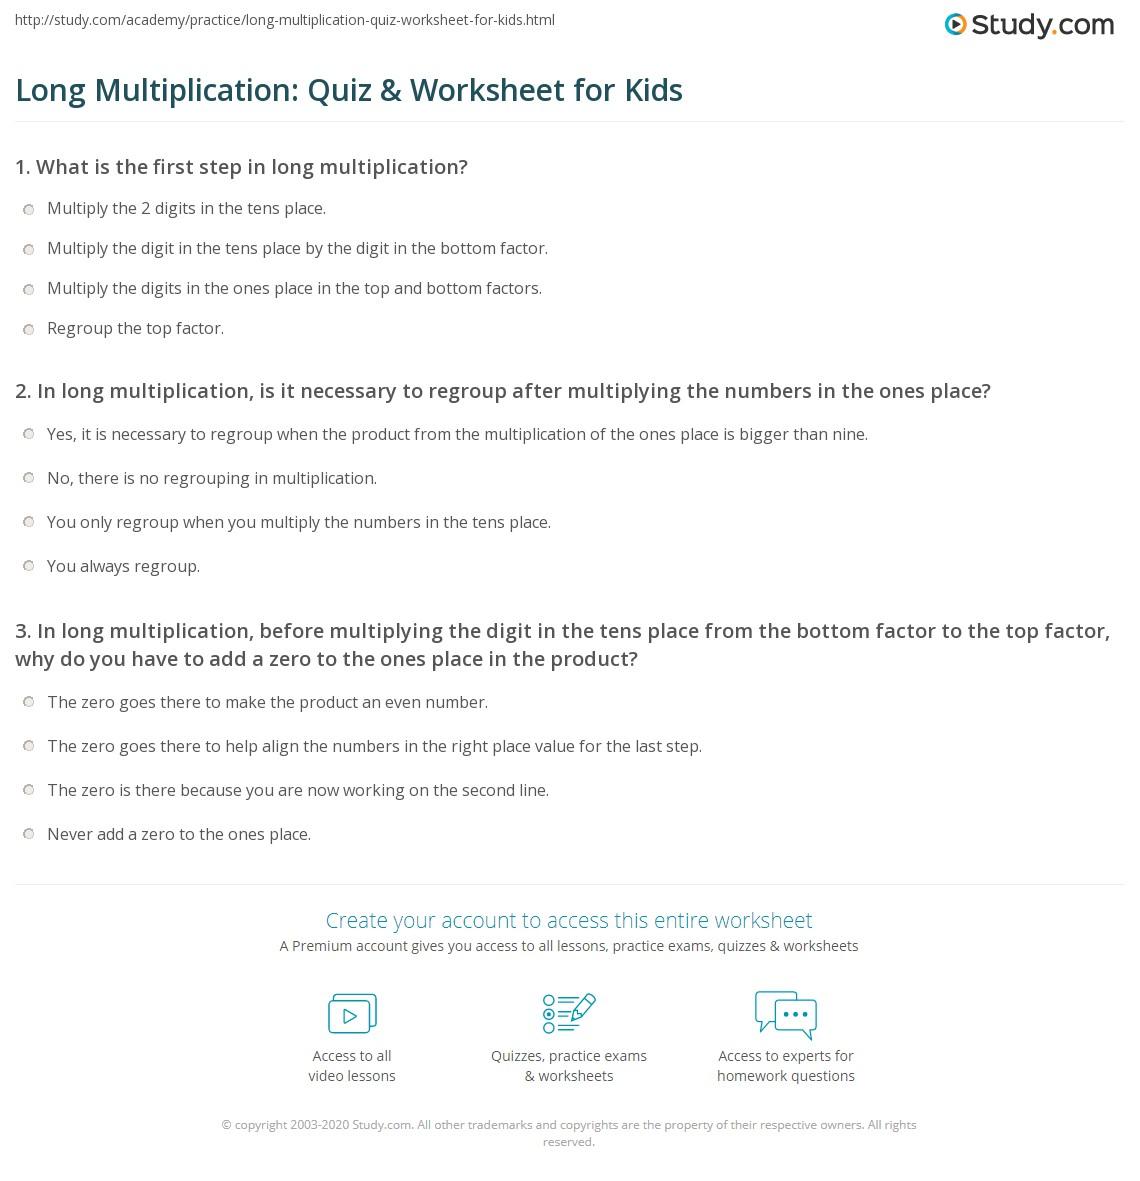 Long Multiplication: Quiz & Worksheet for Kids | Study.com